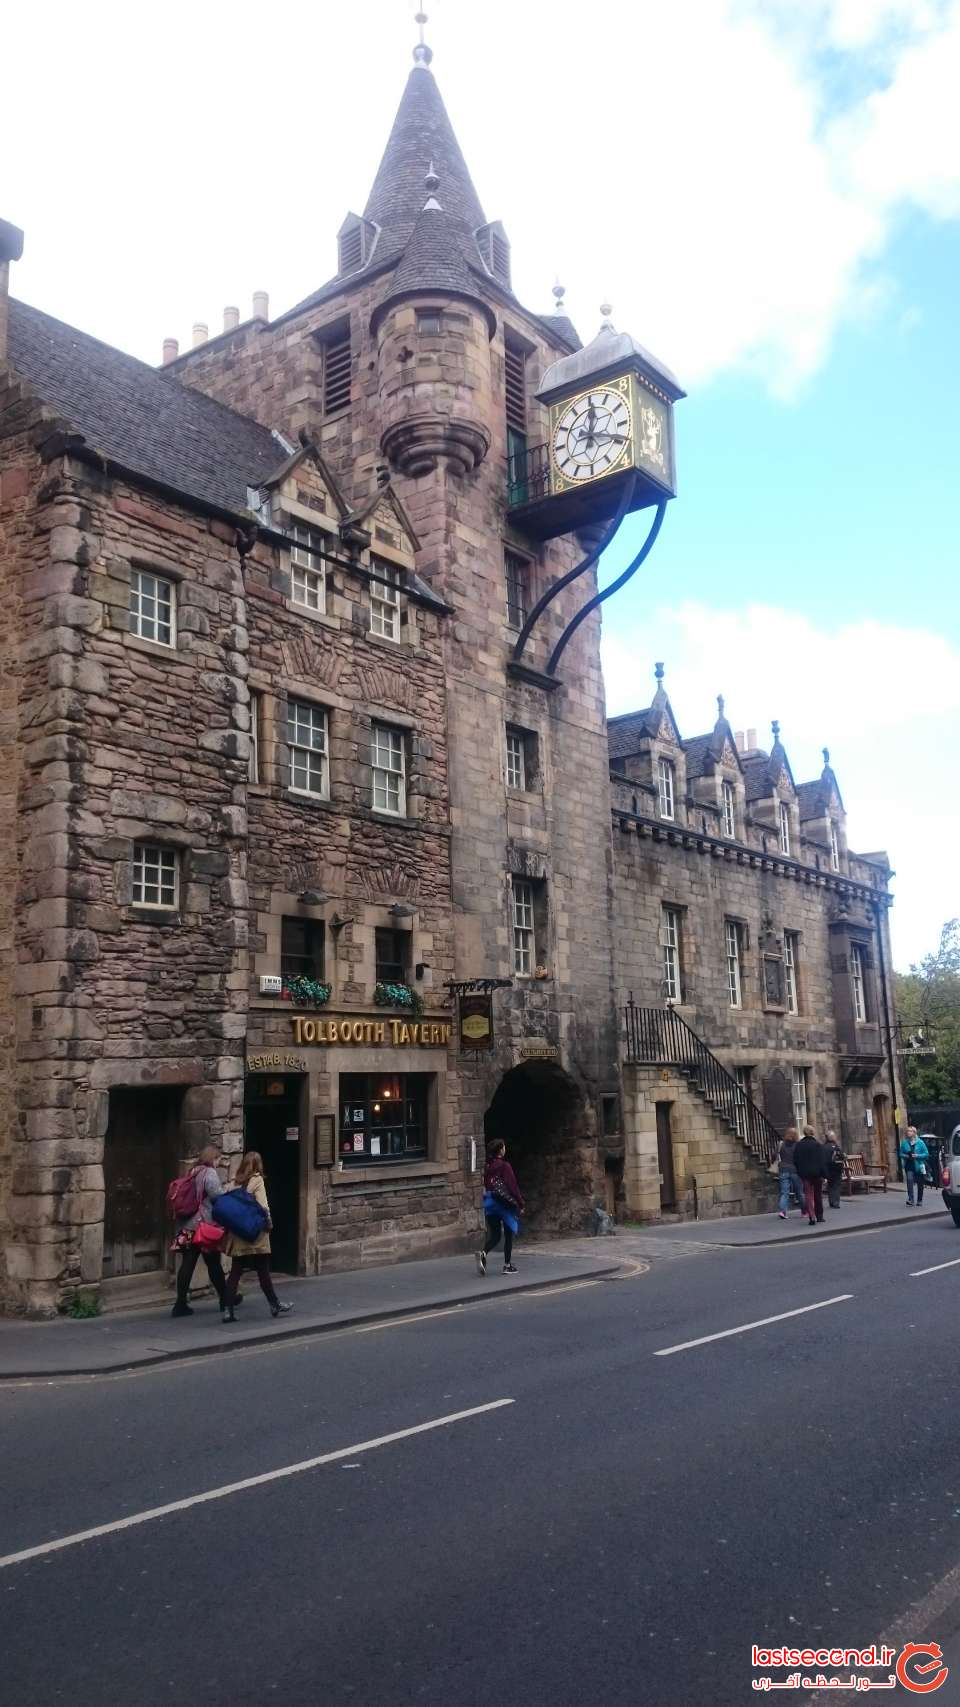 Edinburgh - سفر انگلستان 25شهریور تا 6 مهر 1396 (347).JPG